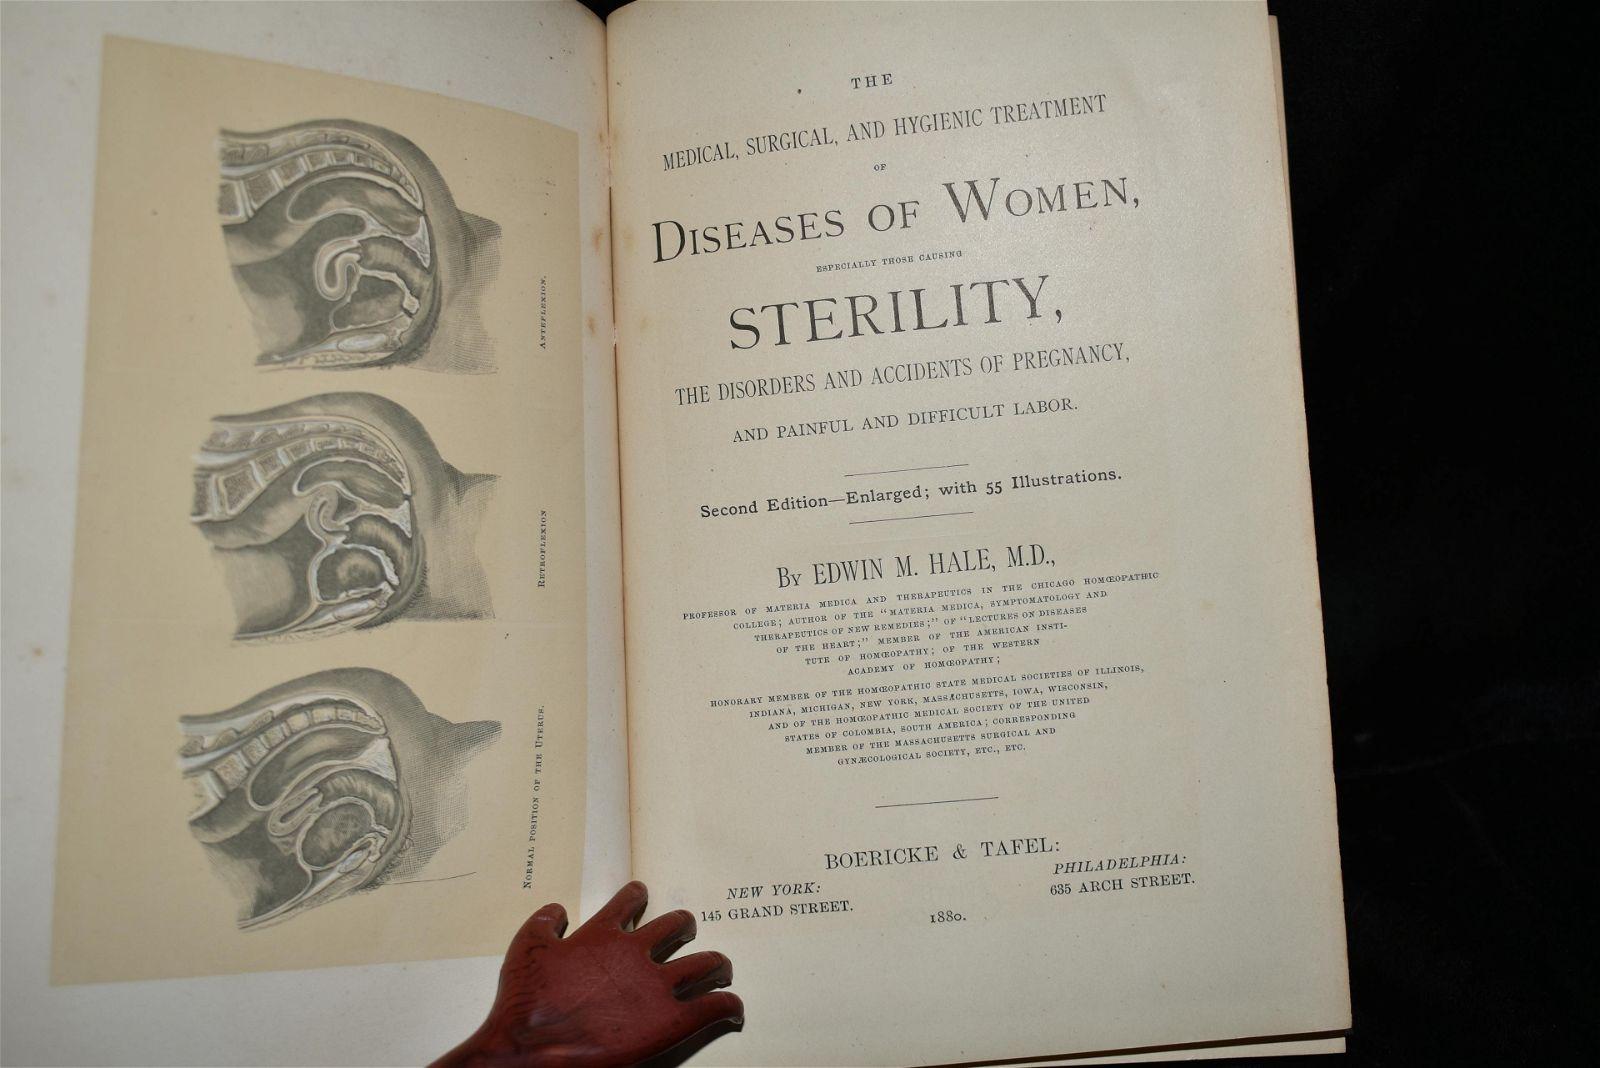 1880 Hale on Diseases of Women